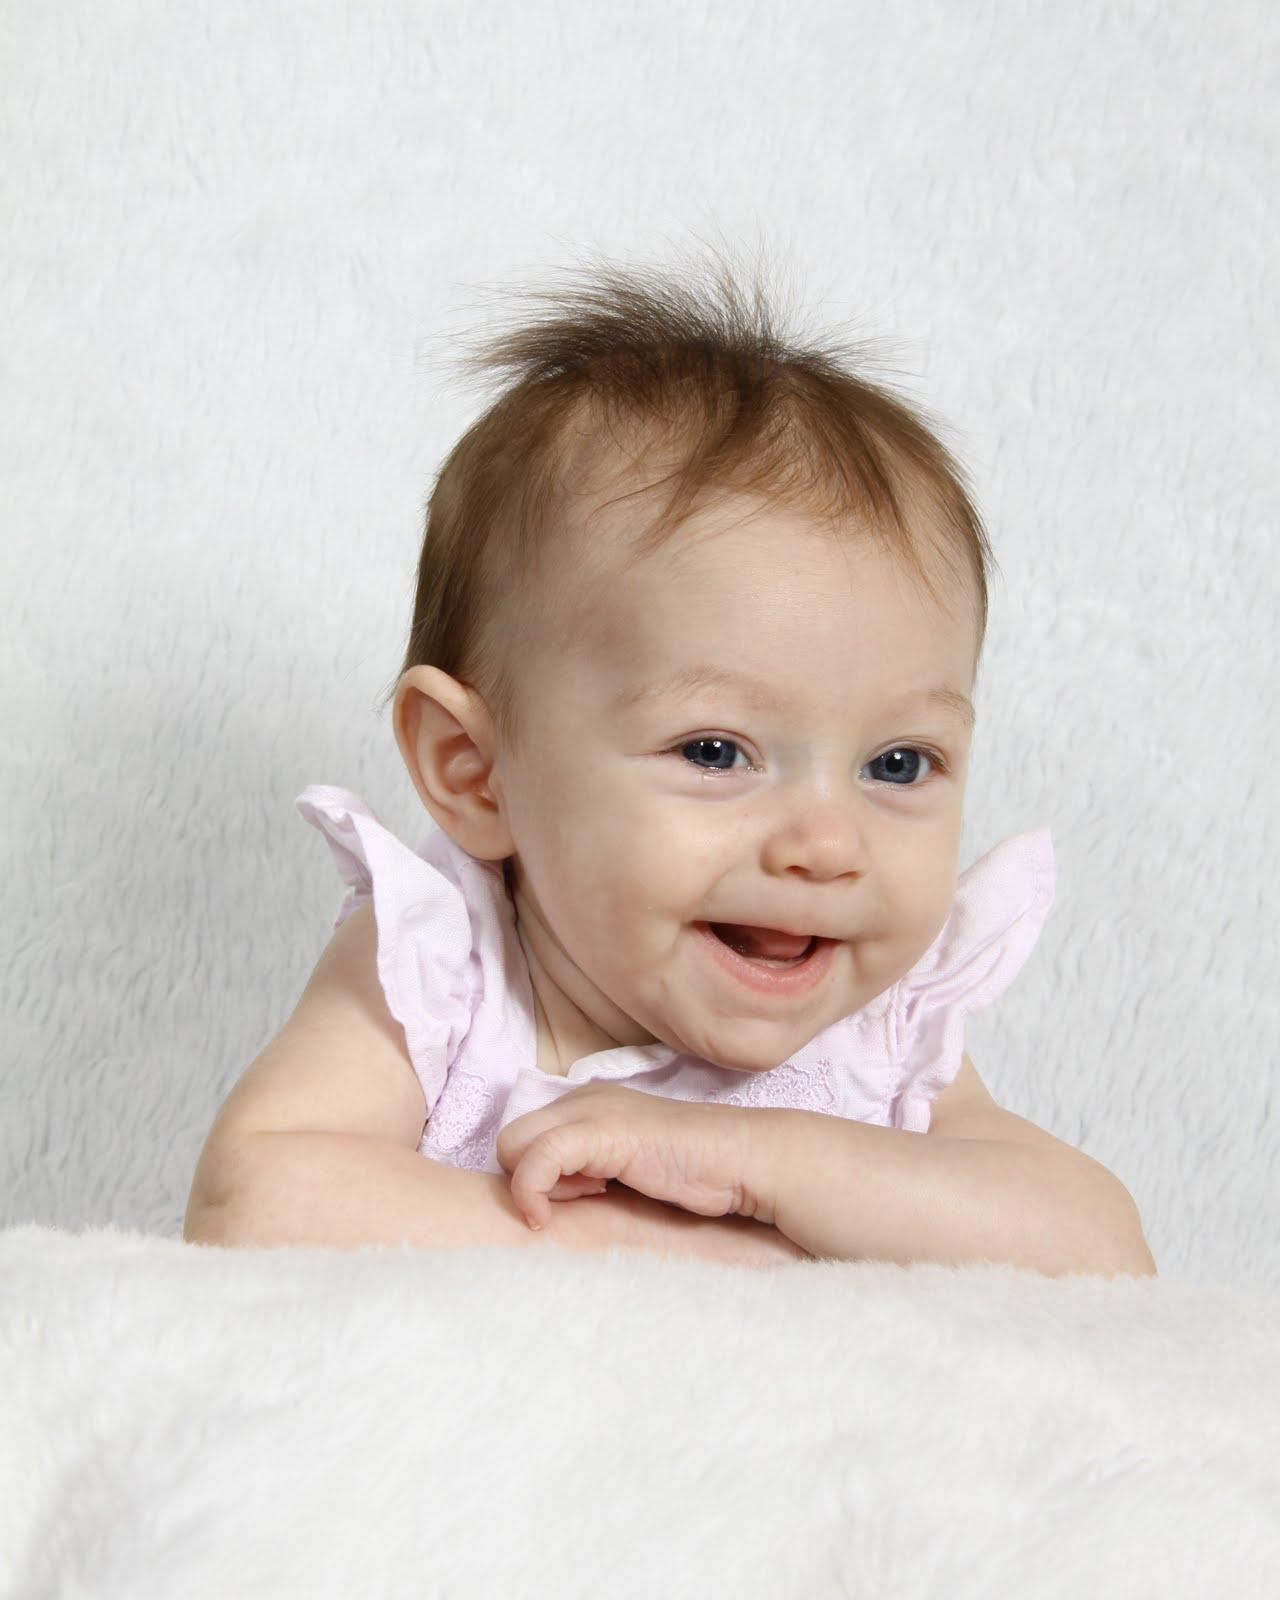 http://1.bp.blogspot.com/_eoFiF-5hmNQ/TEOVdH73tkI/AAAAAAAAAG0/XsY_1mnhgoY/s1600/602012865_12.jpg